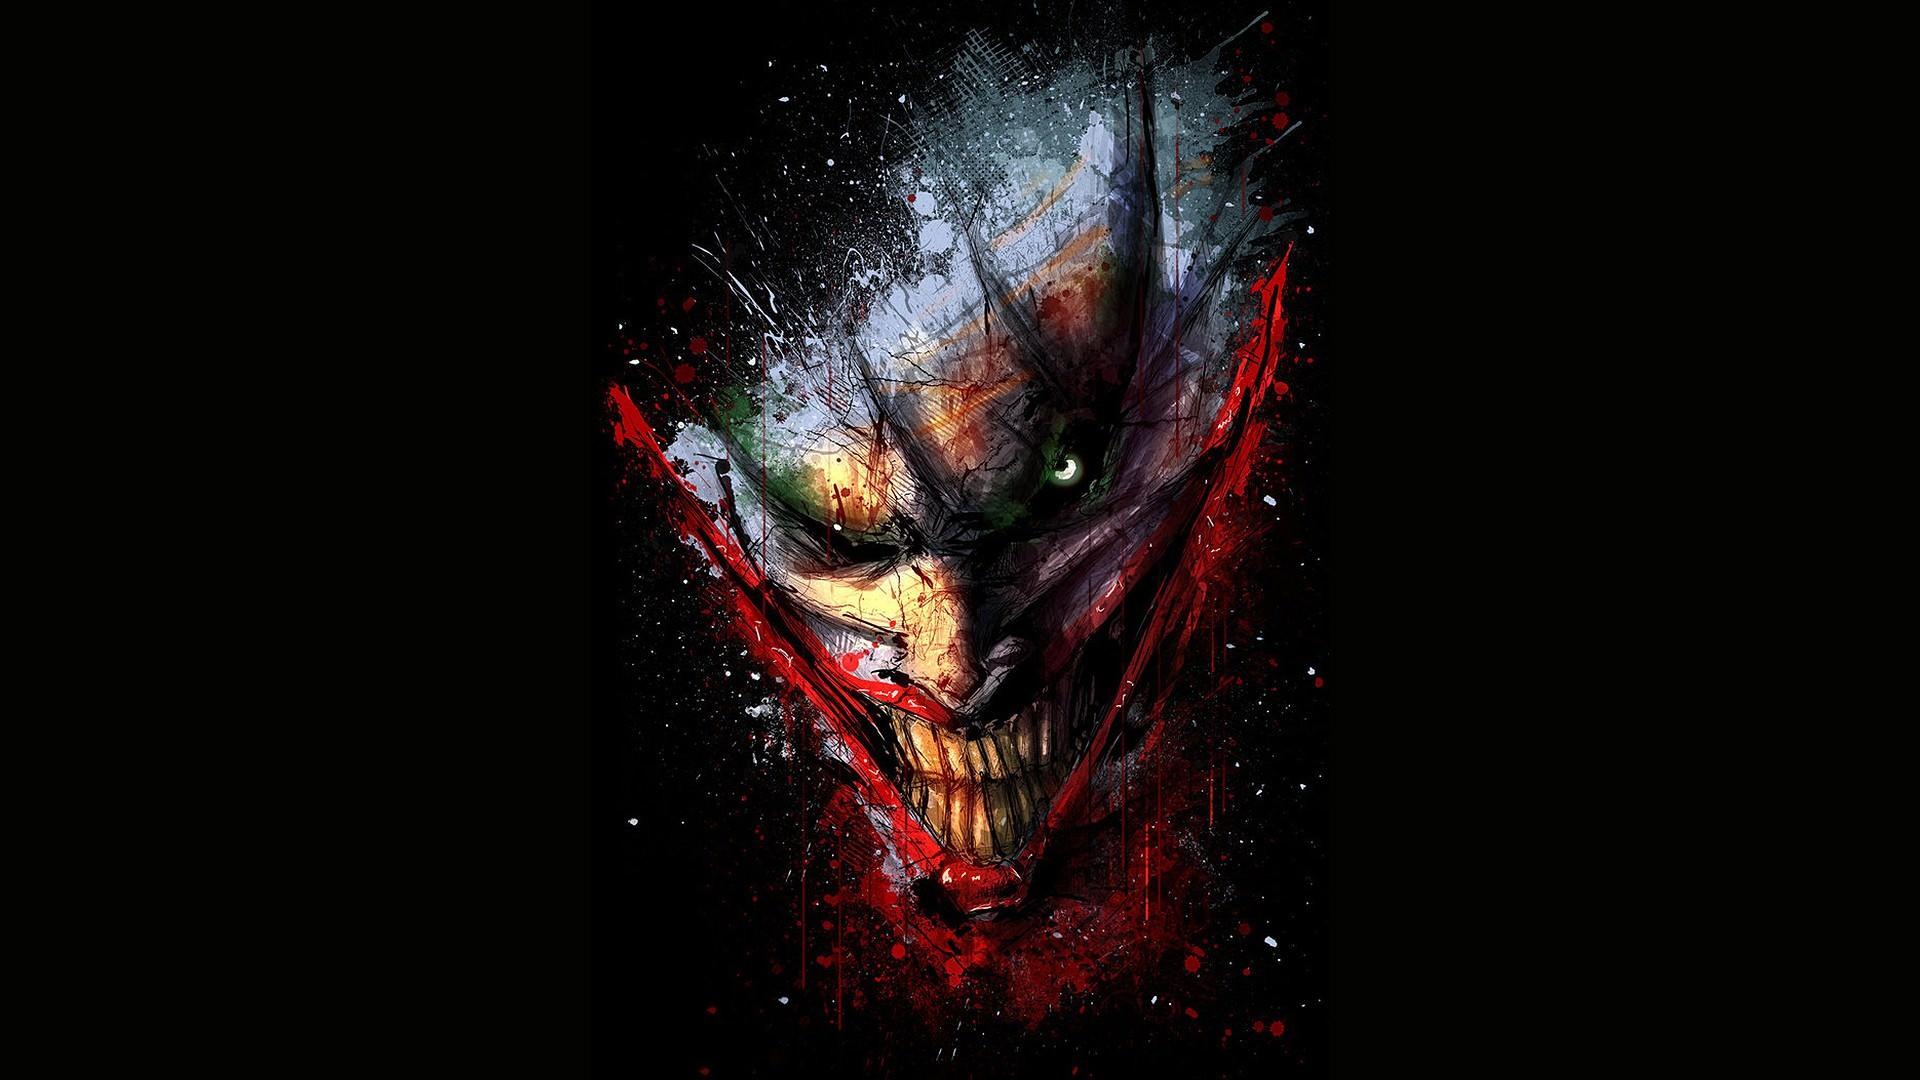 Batman Killing Joke Wallpaper 84 Images